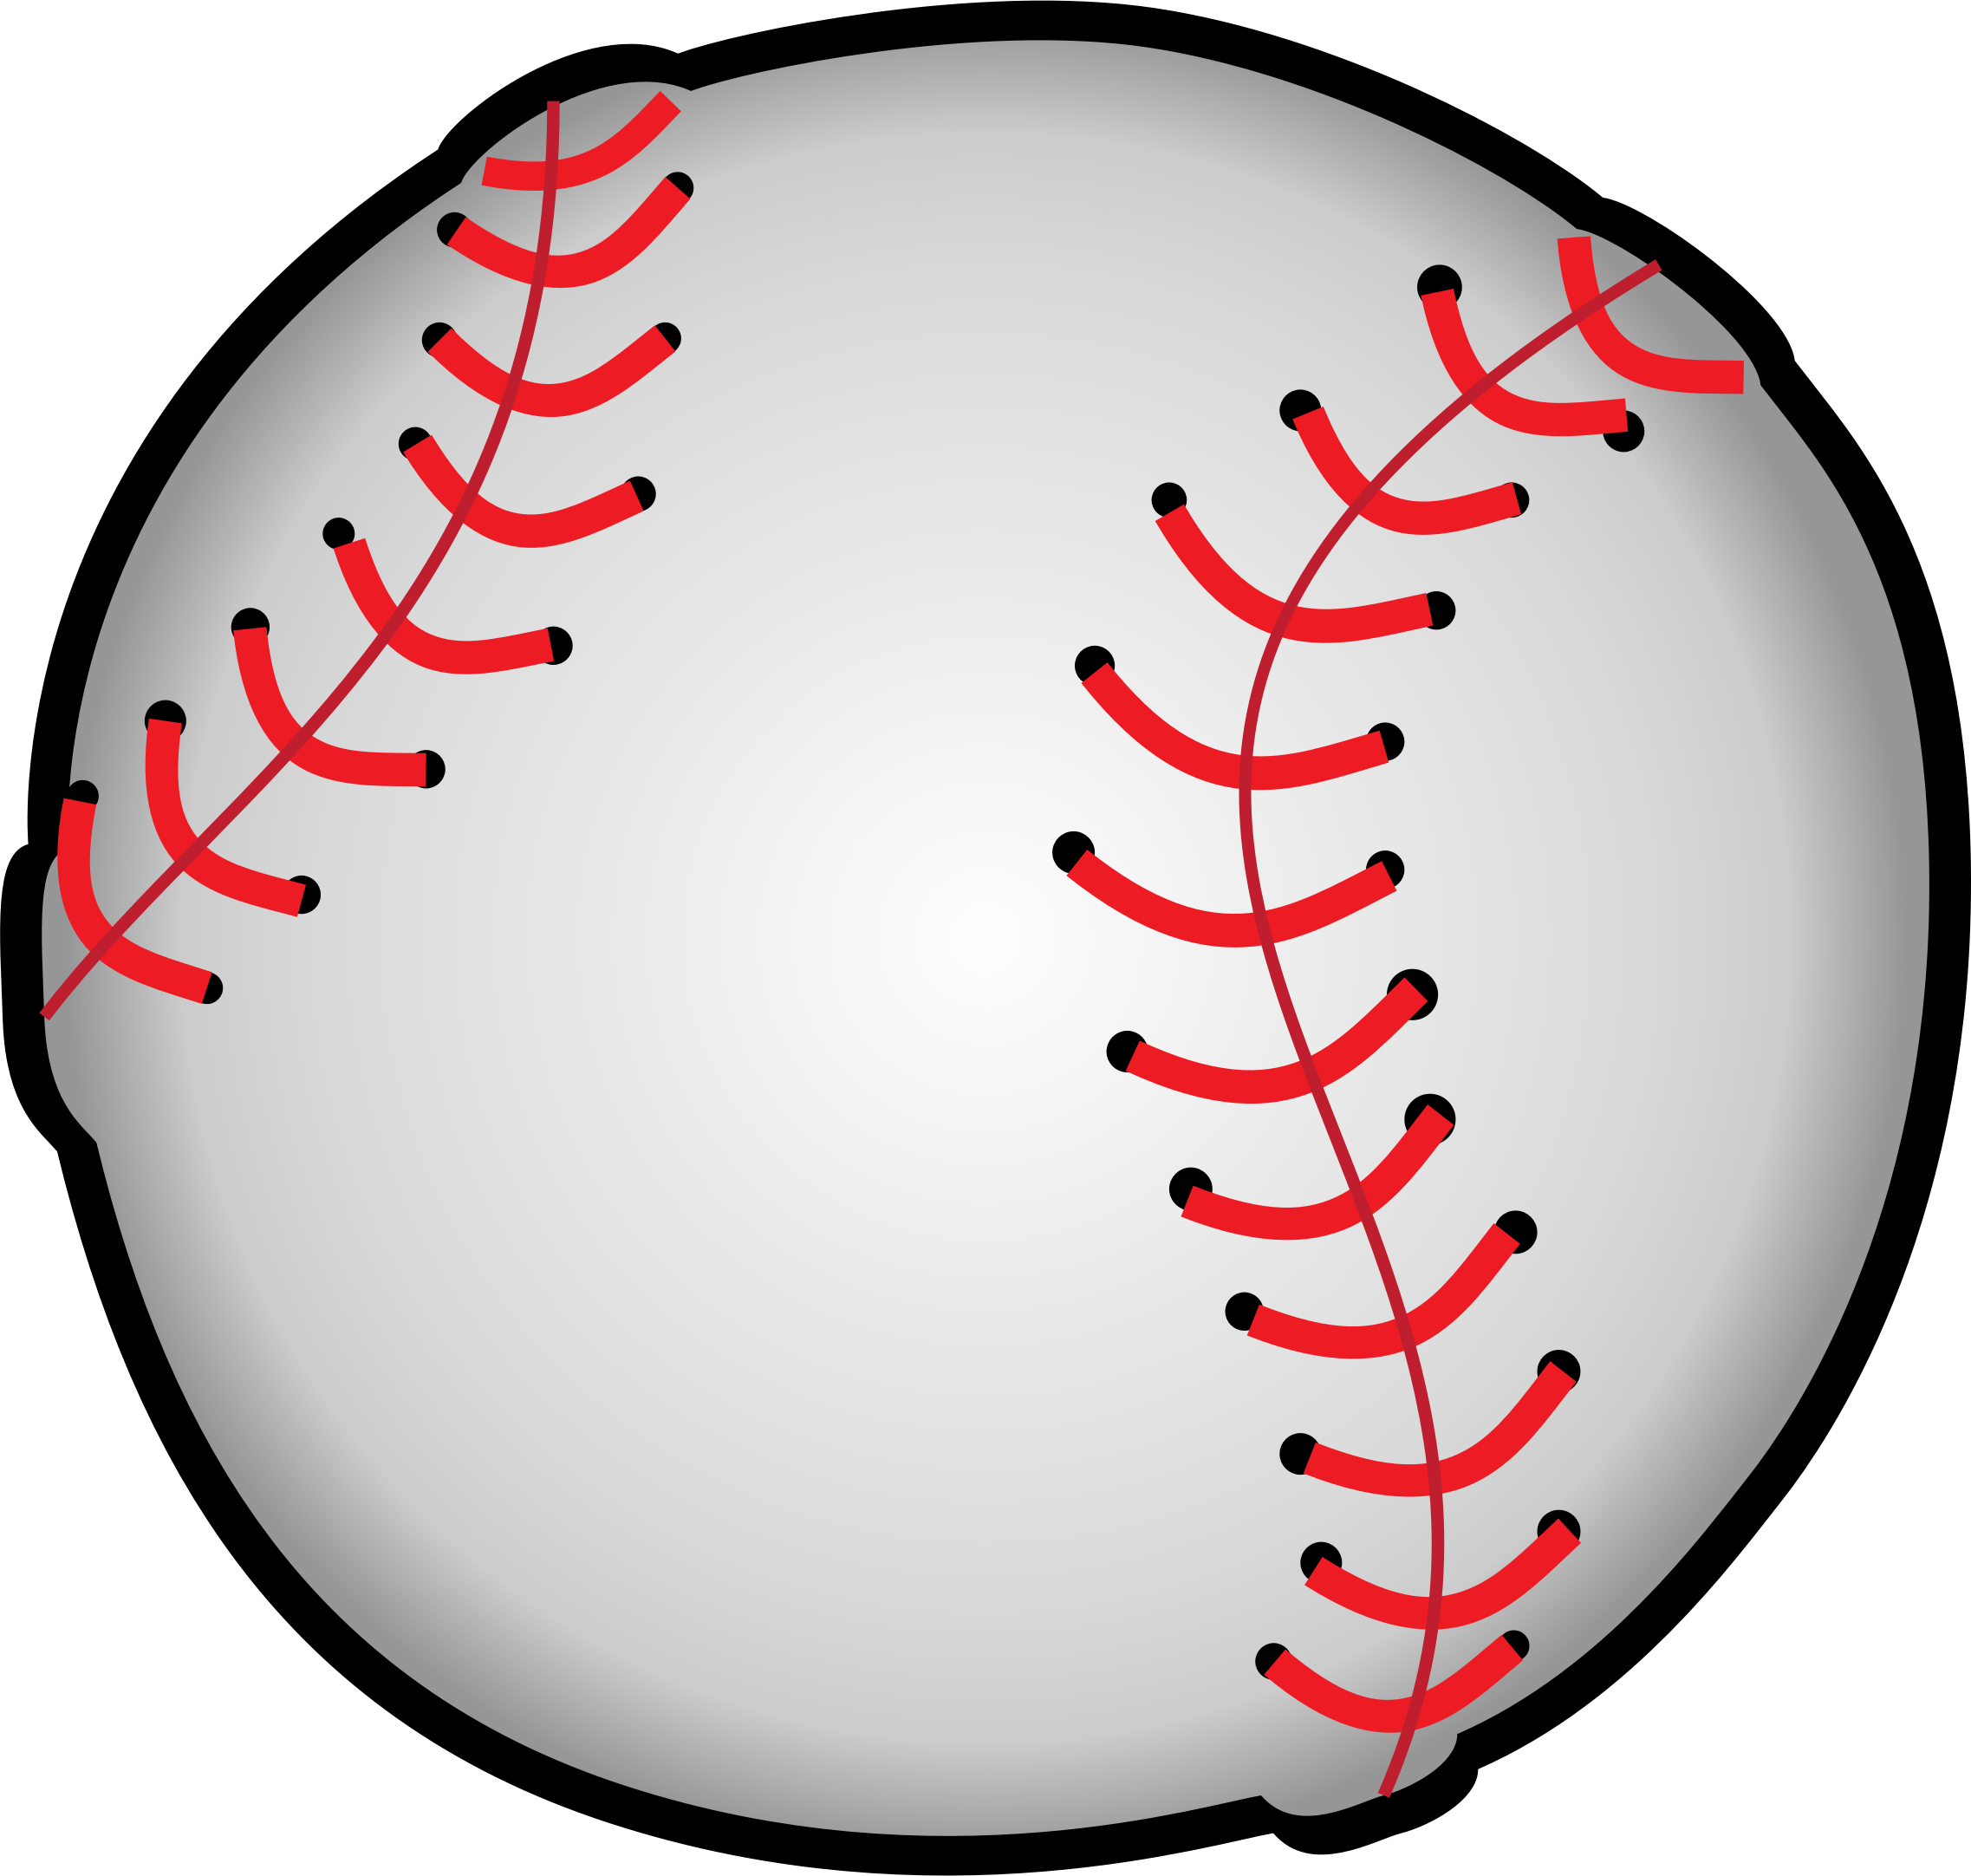 2274x2164 Baseball Images Clip Art 101 Clip Art